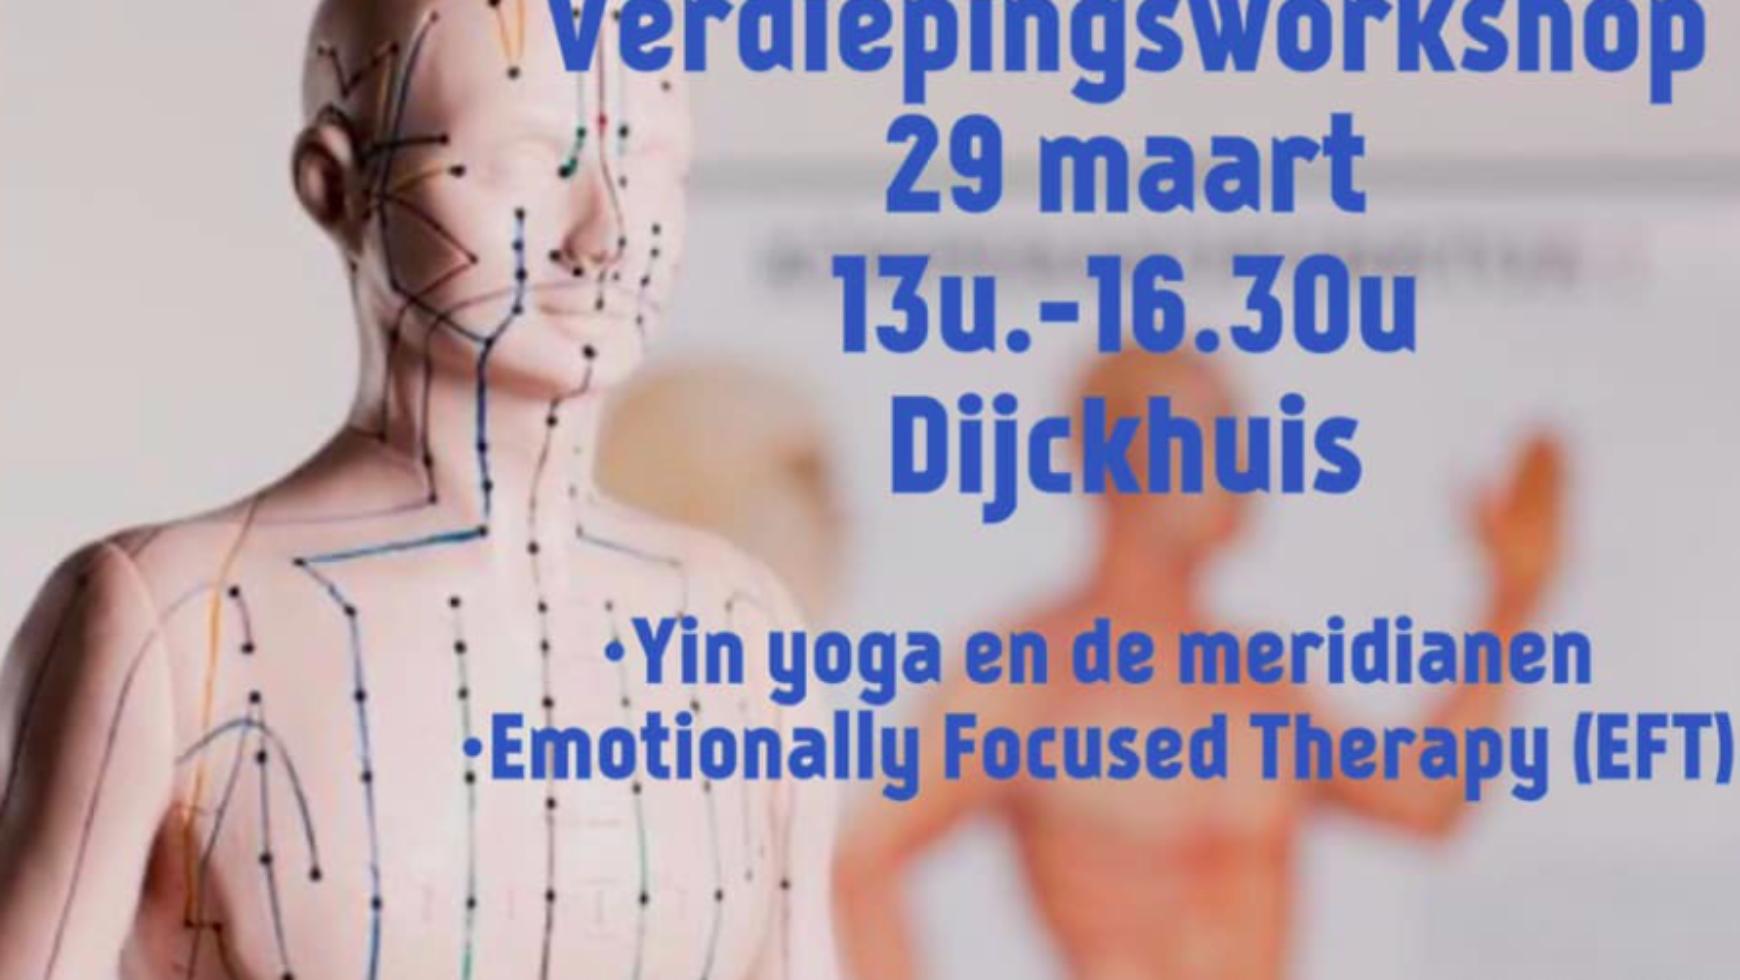 Yin yoga Verdiepingsworkshop